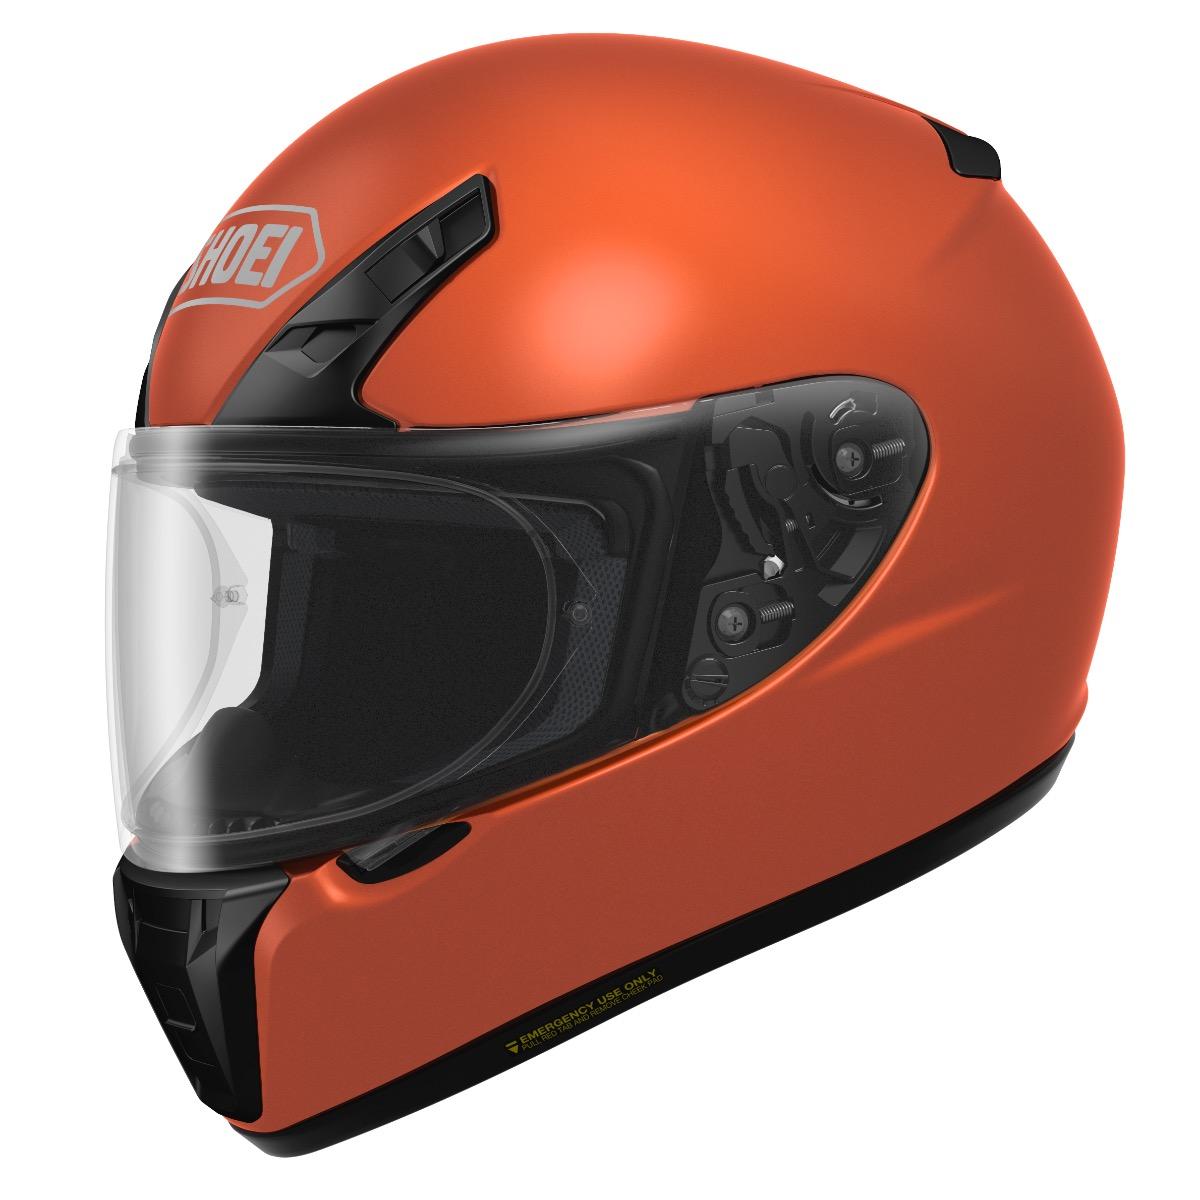 Shoei RF-SR First Look - Tangerine Orange